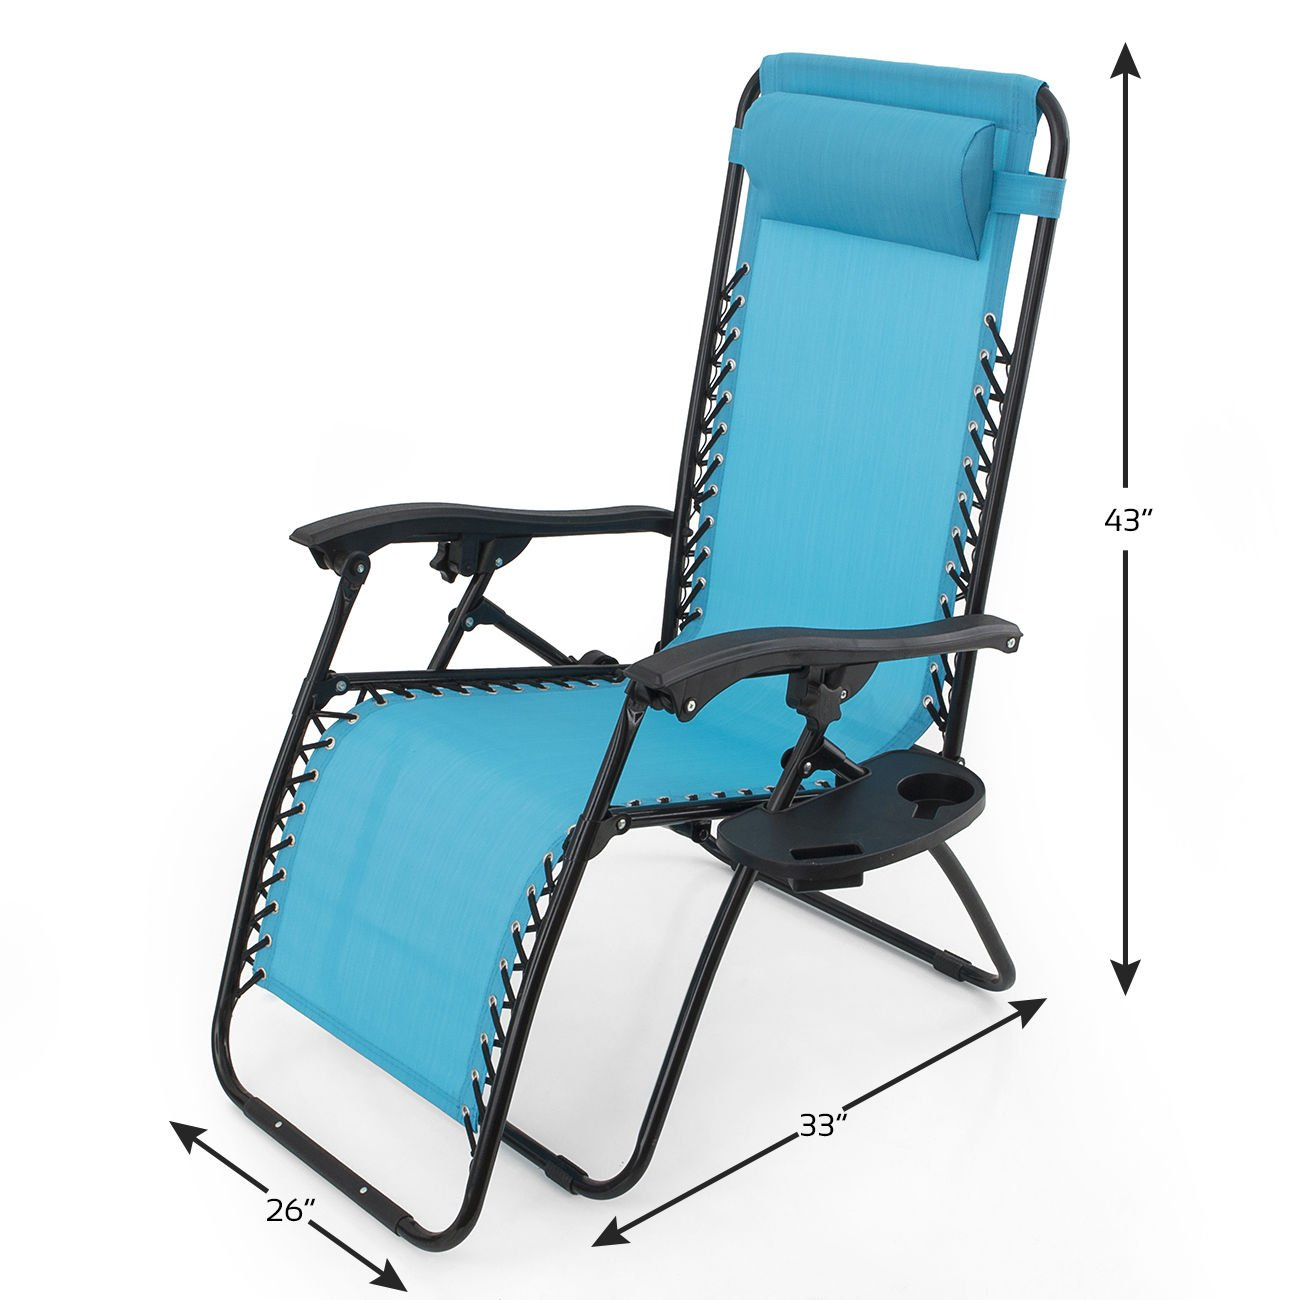 GHP Set of 2 Outdoor Beach Patio 300LBS Capacity Sky Blue Zero Gravity Lounge Recliner Chairs